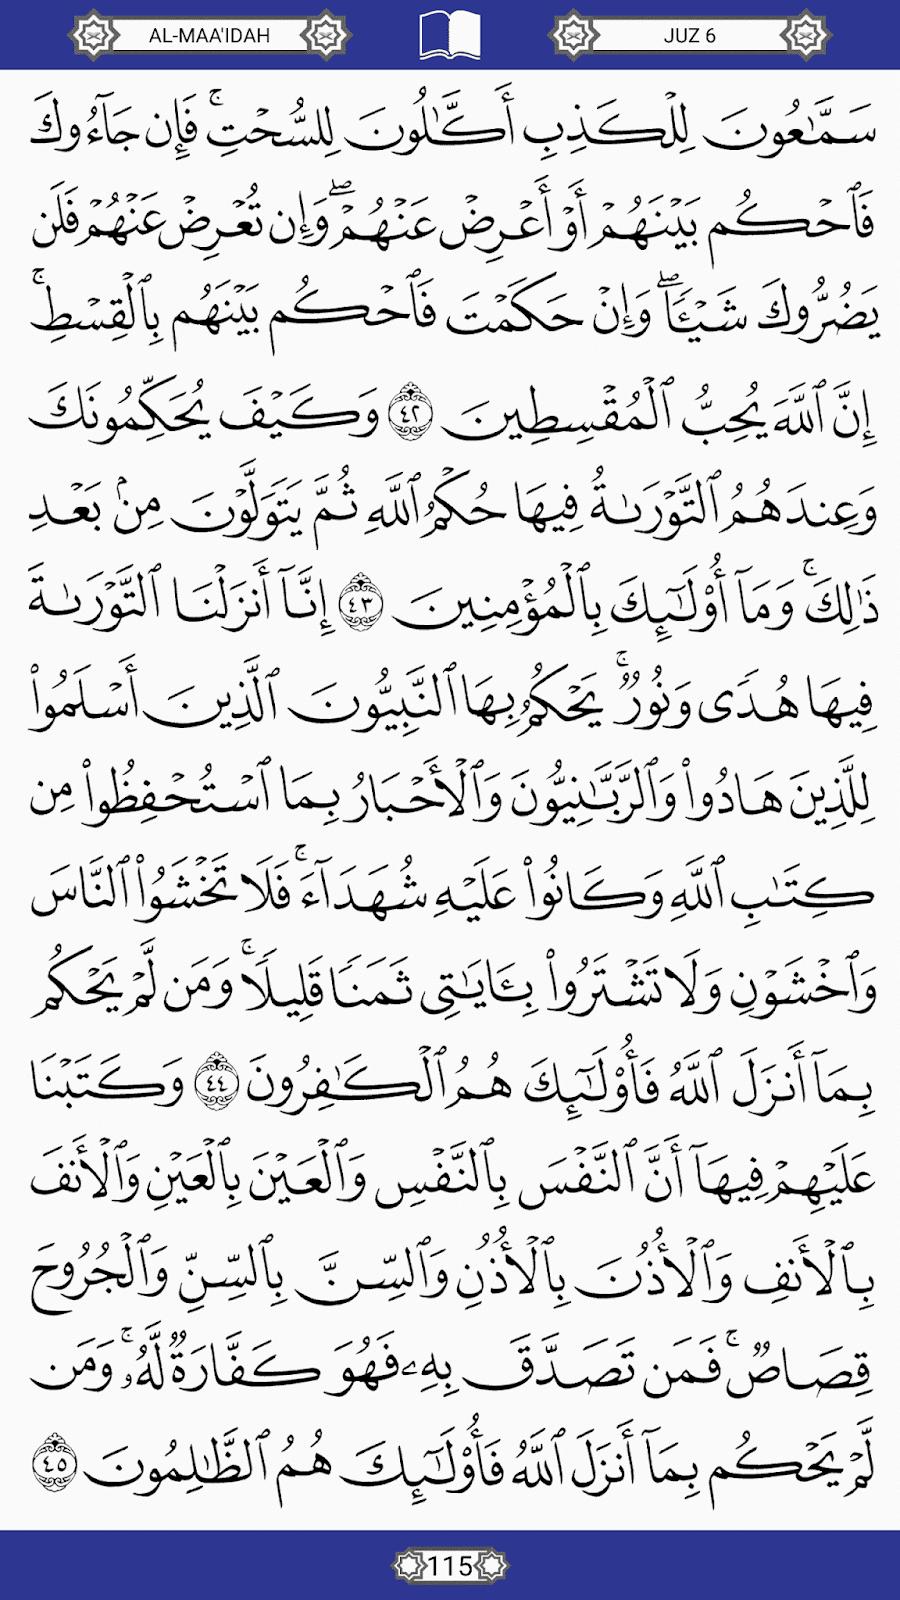 surah al-maidah dan terjemahannya